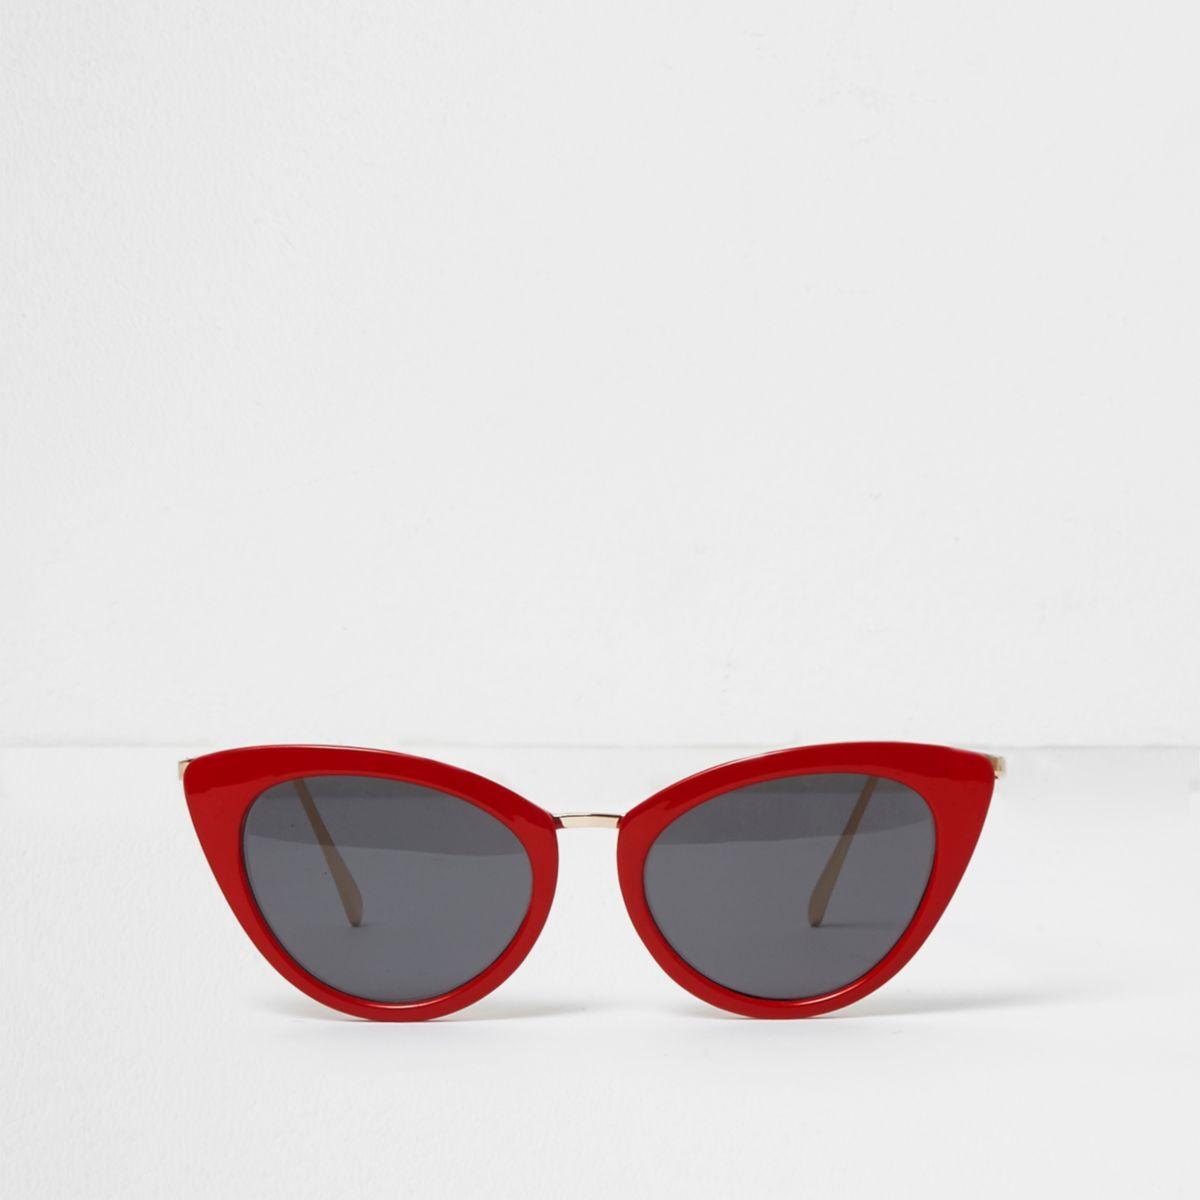 Red cat eye smoke lens sunglasses